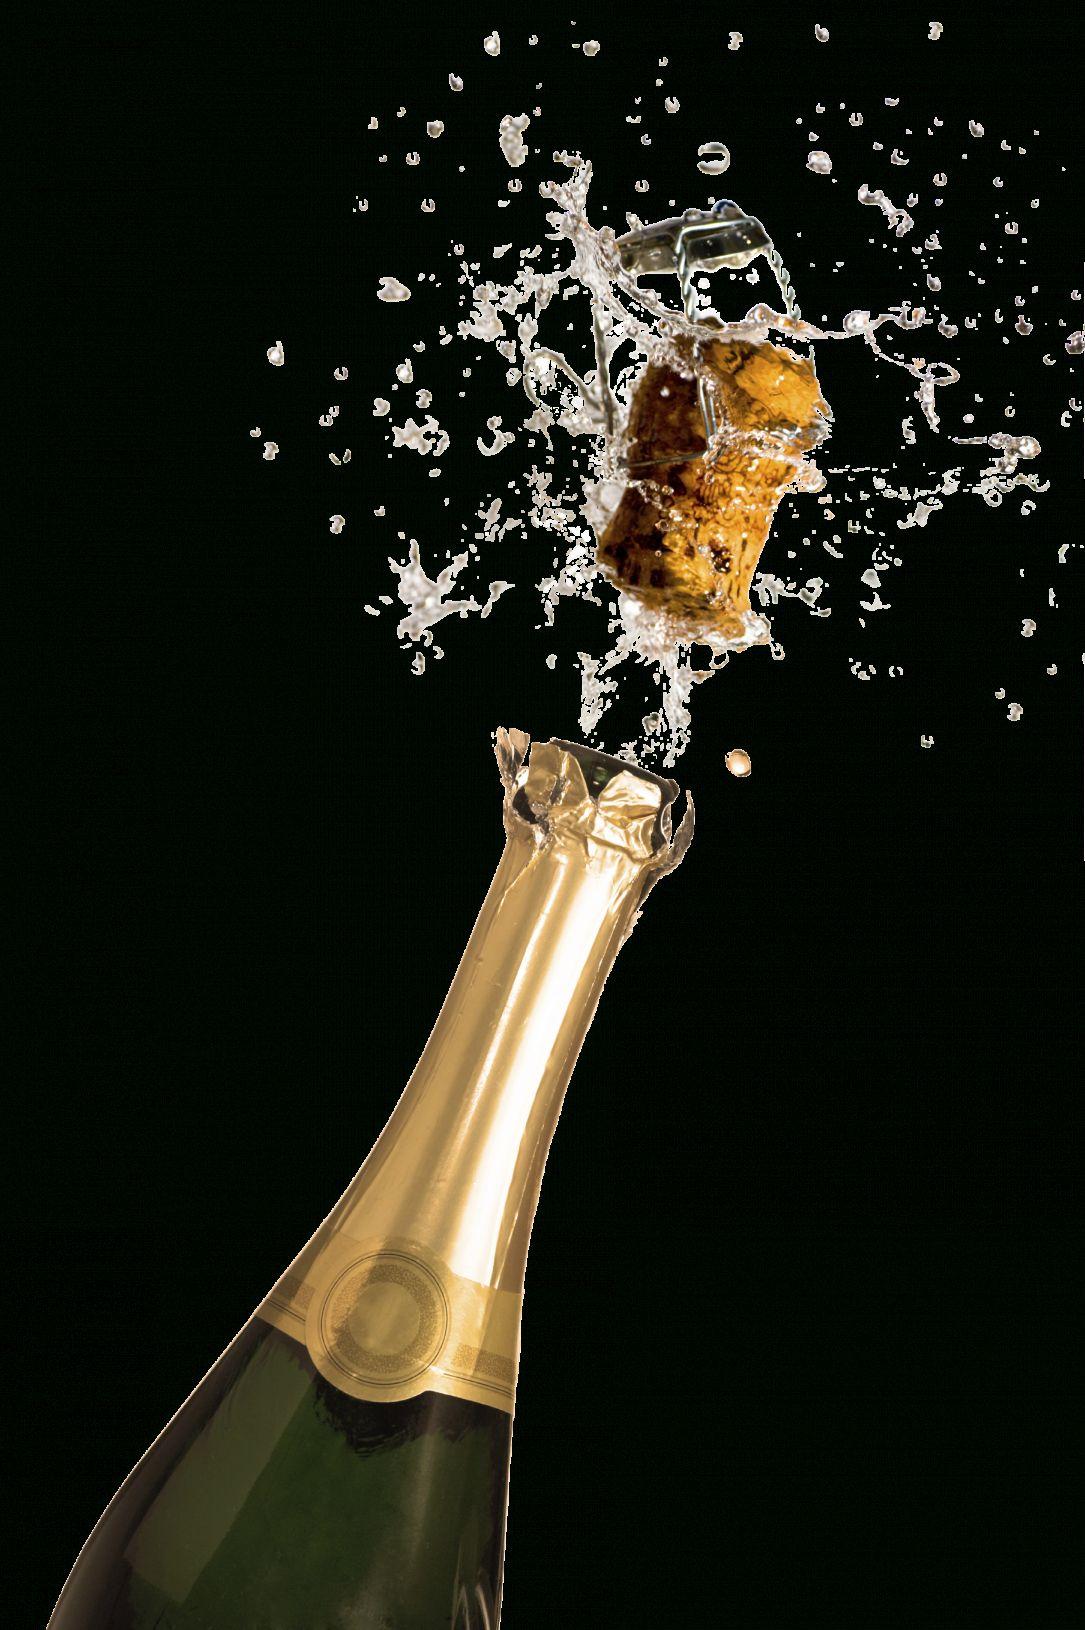 15 Champagne Popping Png Champagne Pop Champagne Pop Champagne